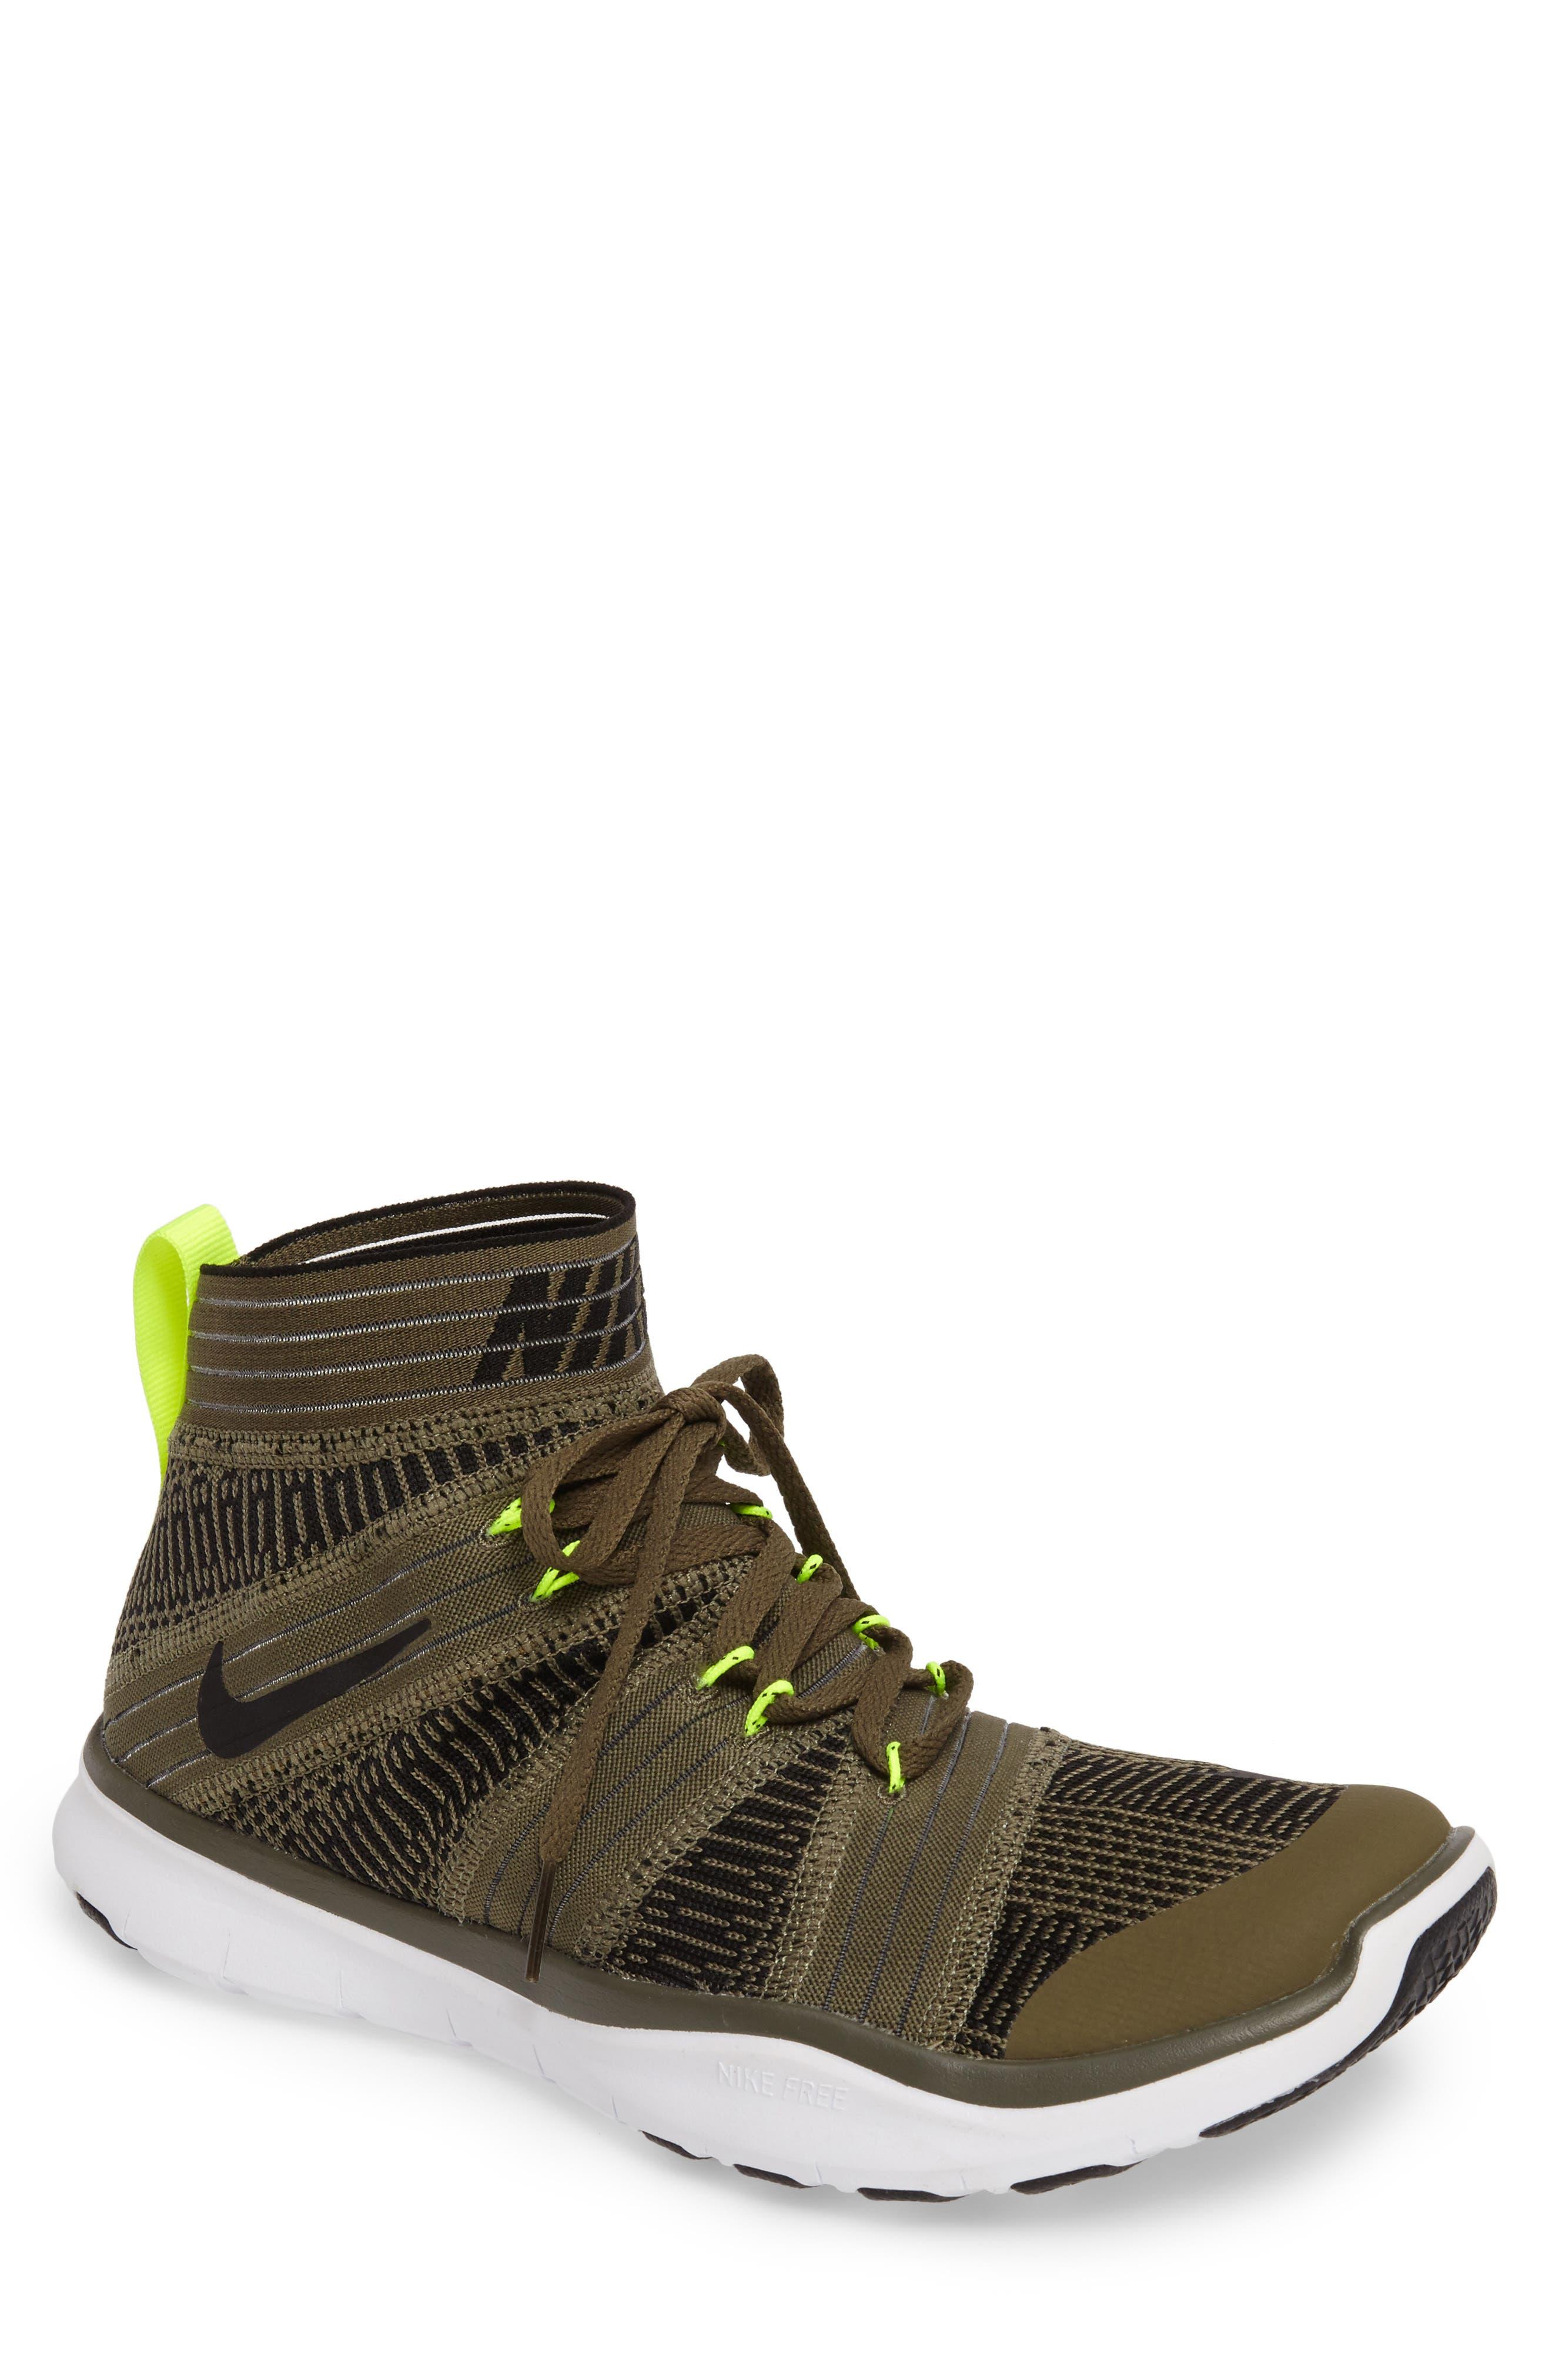 Main Image - Nike Free Train Virtue Training Shoe (Men)